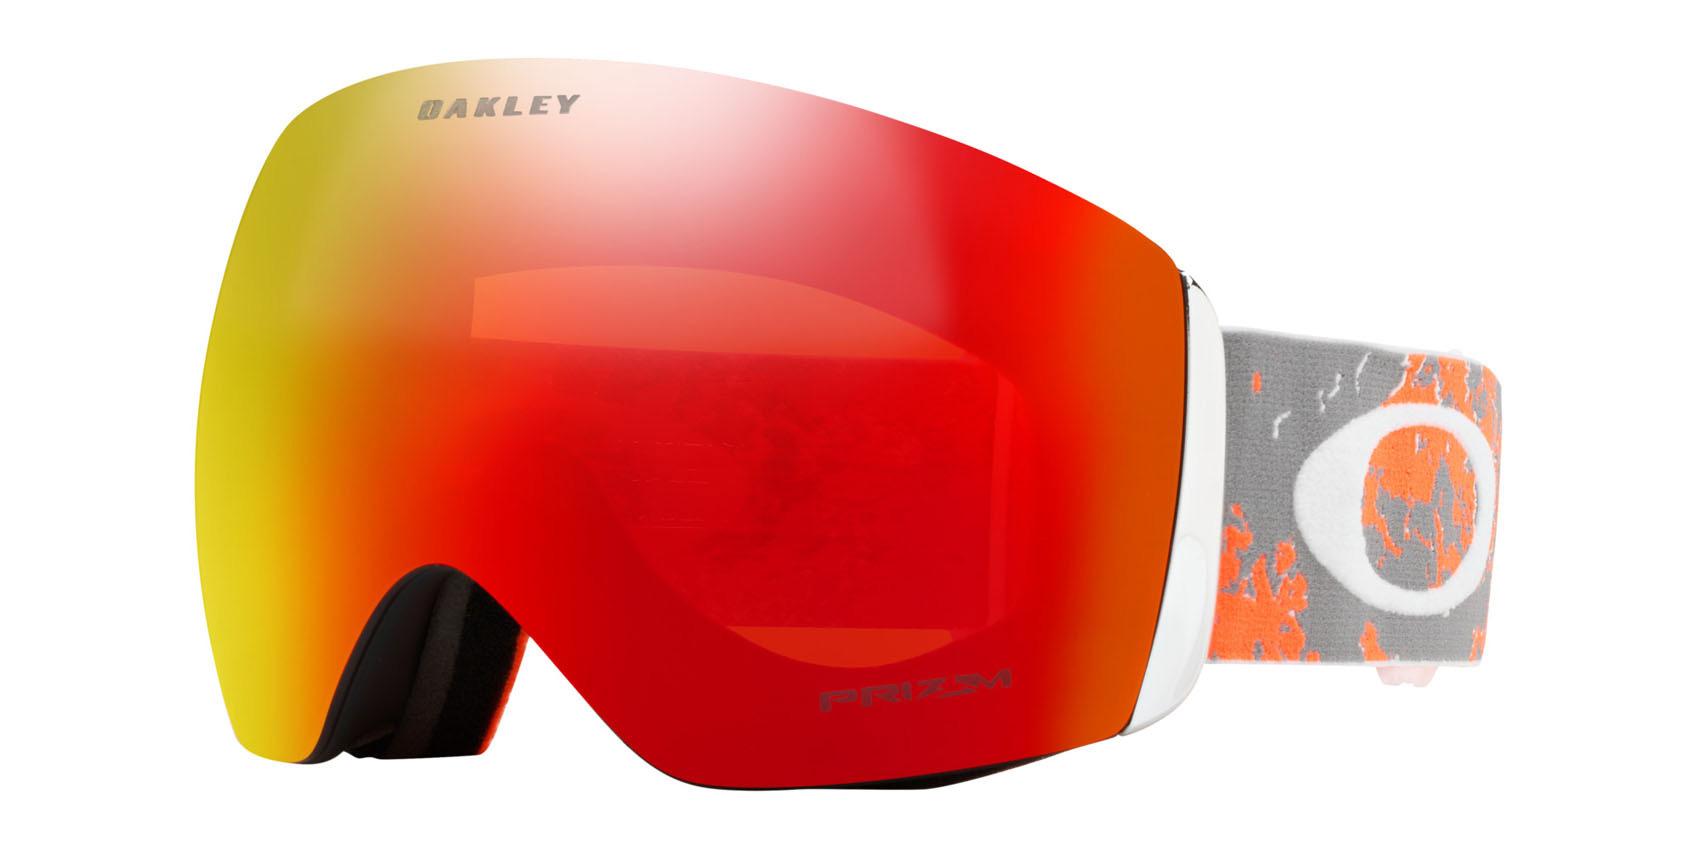 84755159c1cb5 Sentinel Oakley Snowboard Goggles - Flight Deck - Arctic Fracture Orange,  Prizm Torch